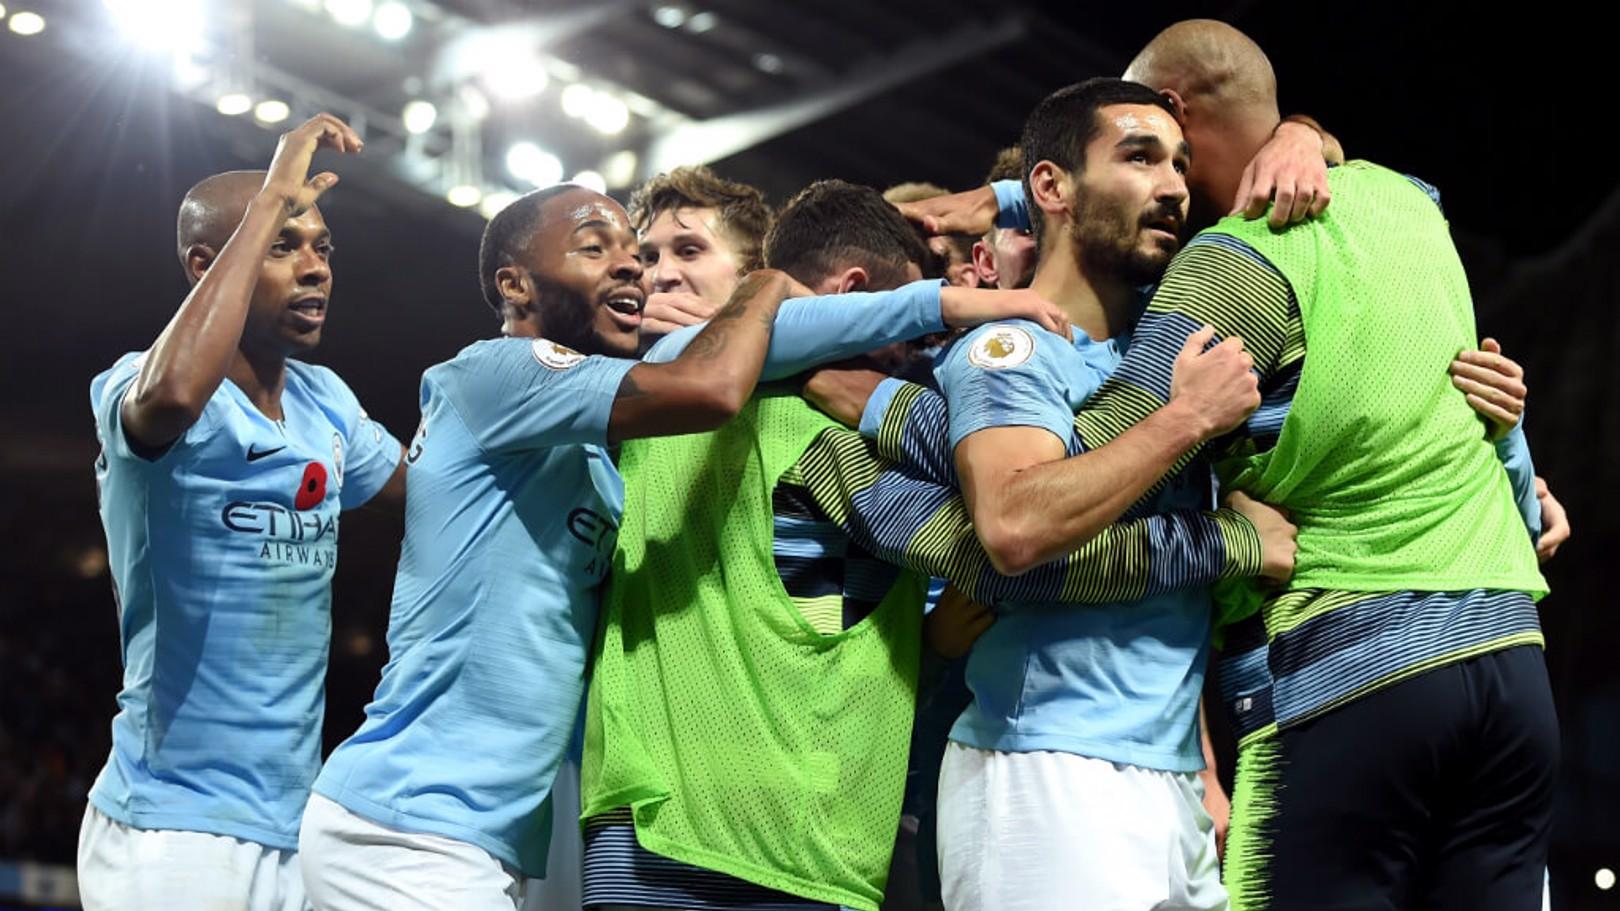 DEMOLITION DERBY: Fernandinho has praised City's performance in the Manchester derby